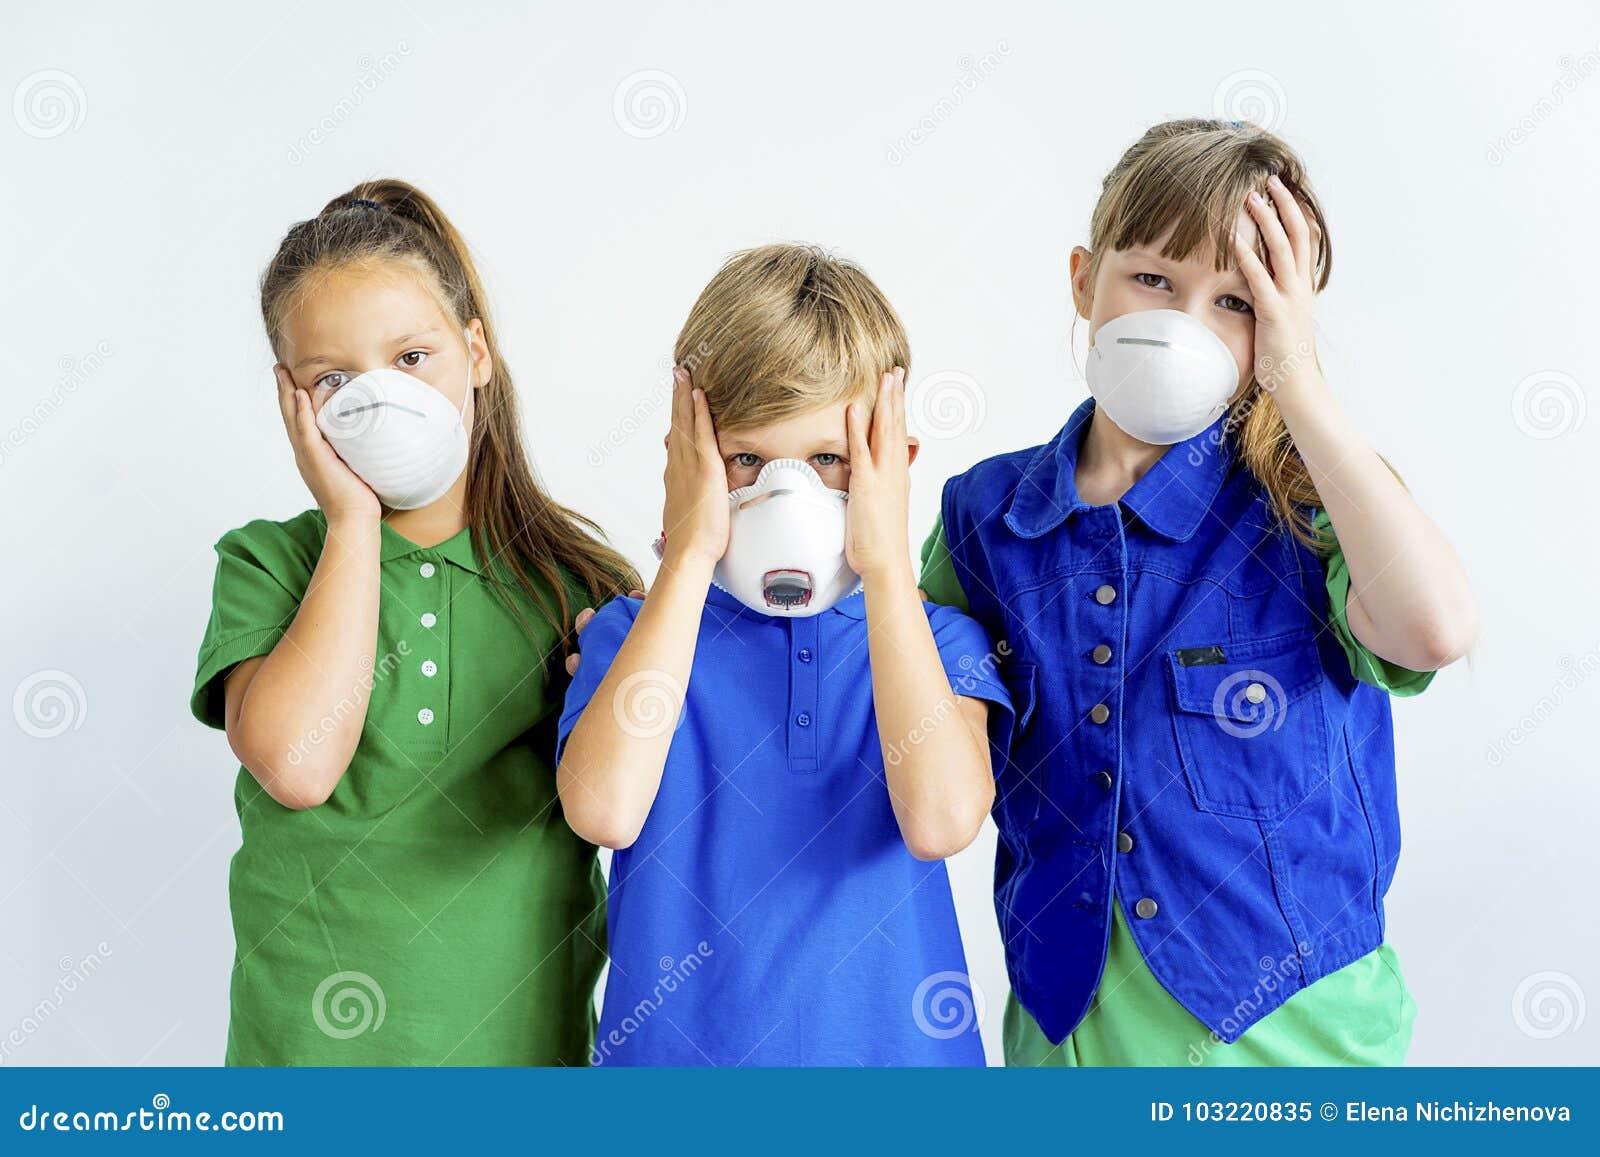 masques respiratoires enfant